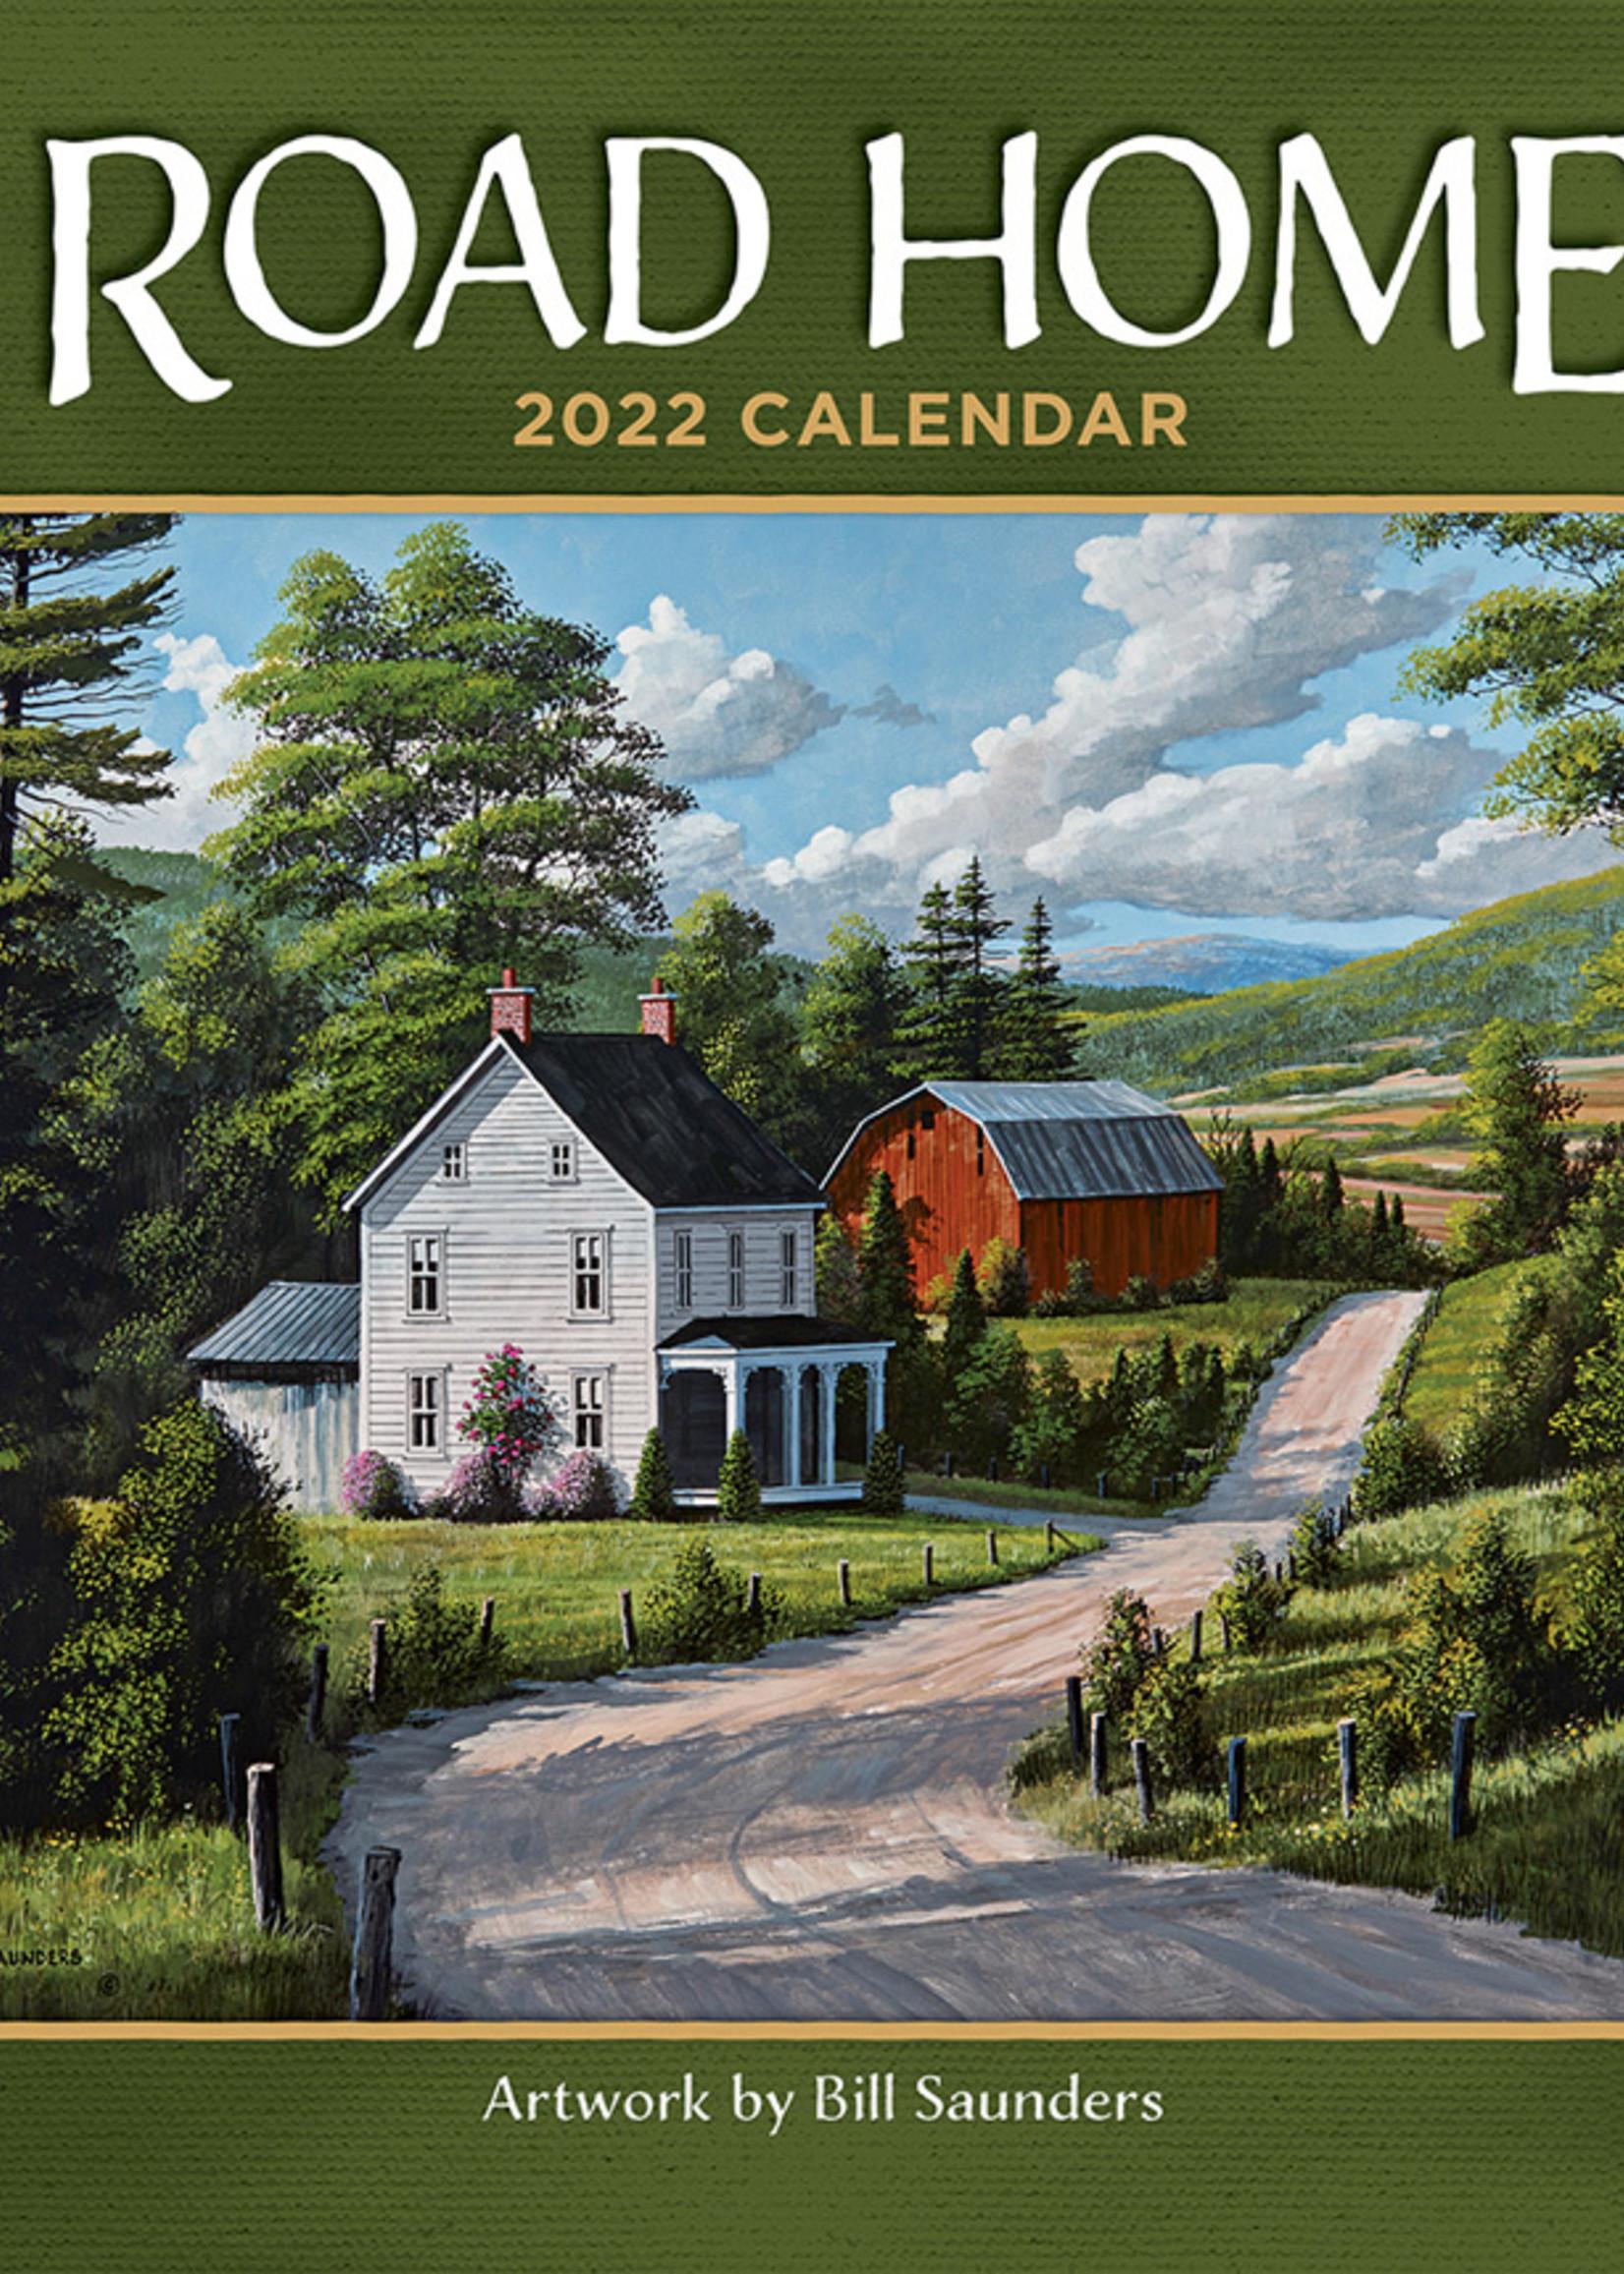 Road Home Calendar 2022